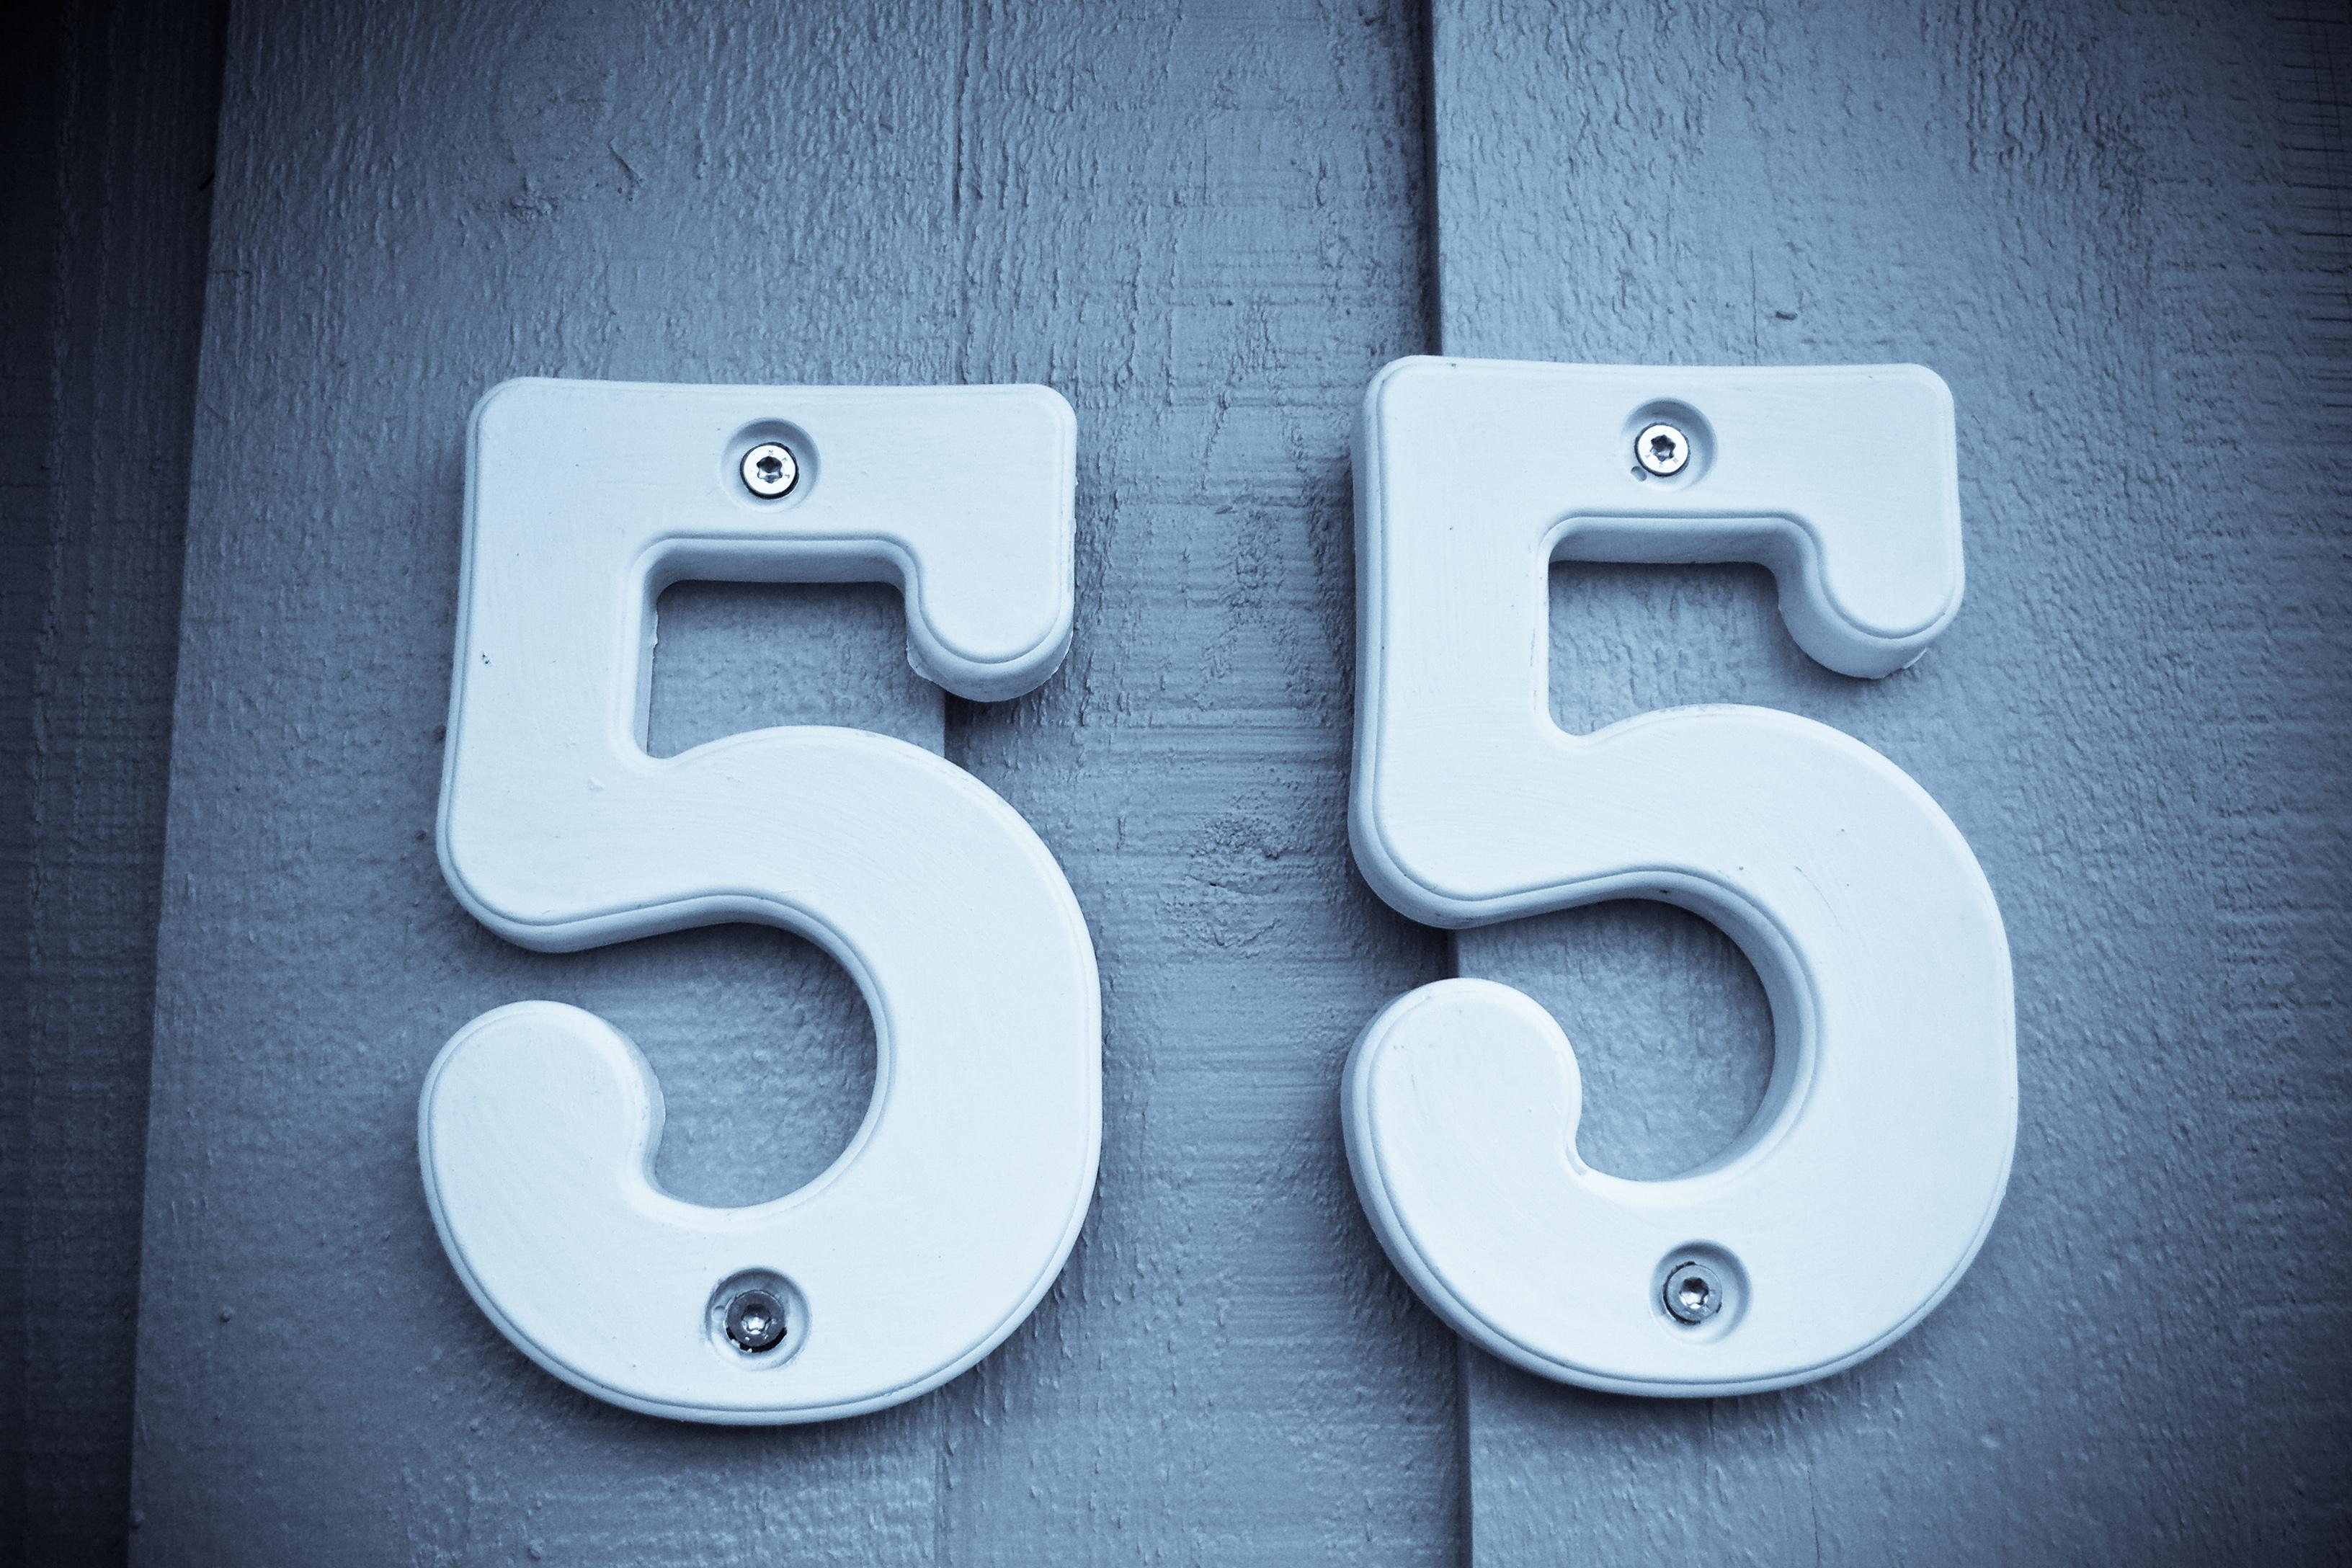 55 >> File 55 Jpg Wikimedia Commons